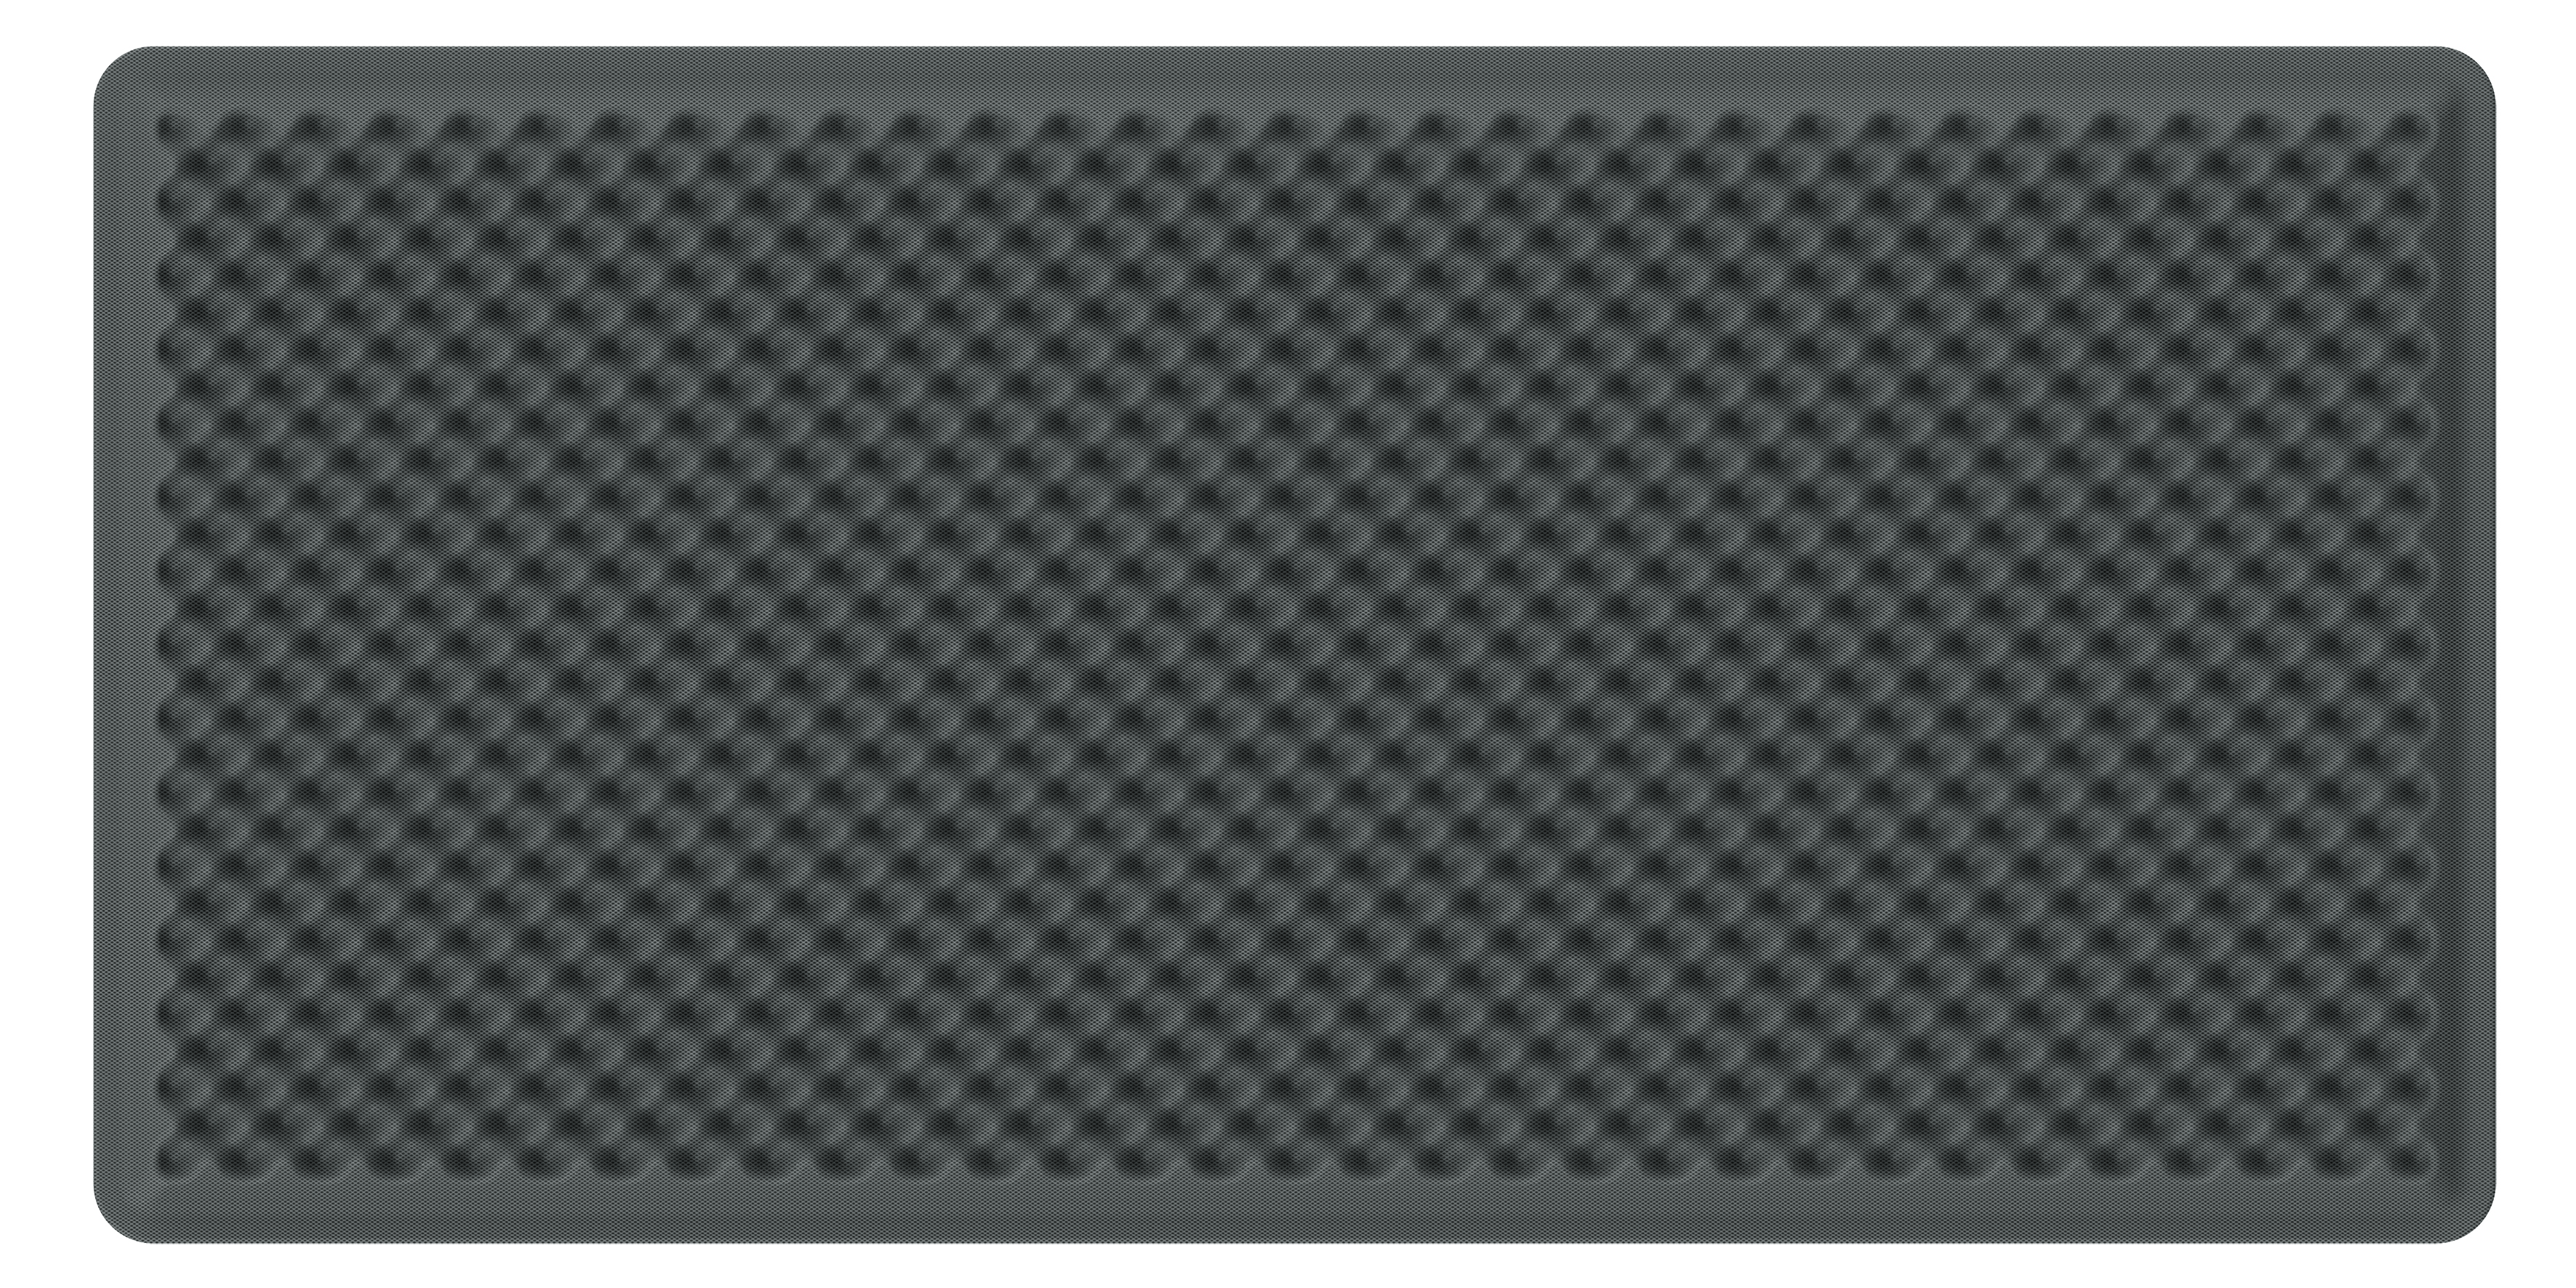 Artemide Akustikpanel Schallabsorbierend EGGBOARD WALL SUSP./CEILING ACOUSTIC PANEL 160x80 GREY